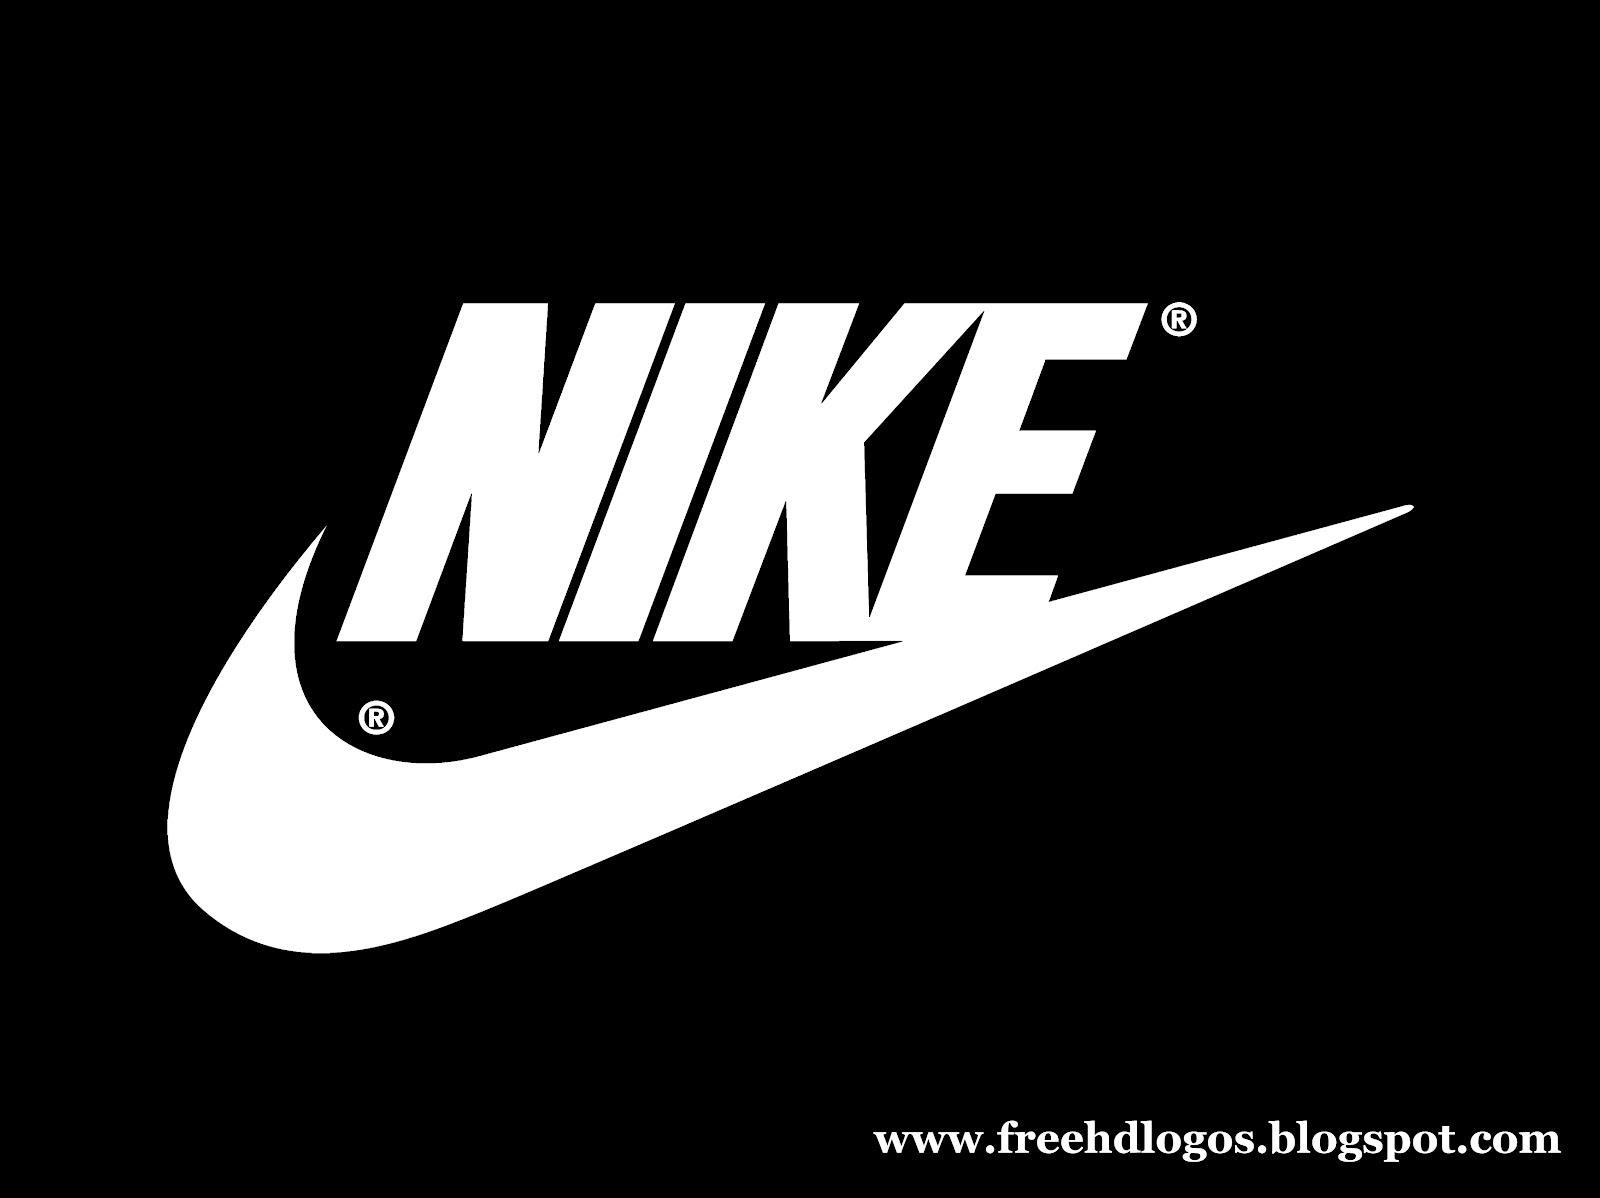 NikelogodarkwithNikenamefreehdlogosjpg 1600x1198